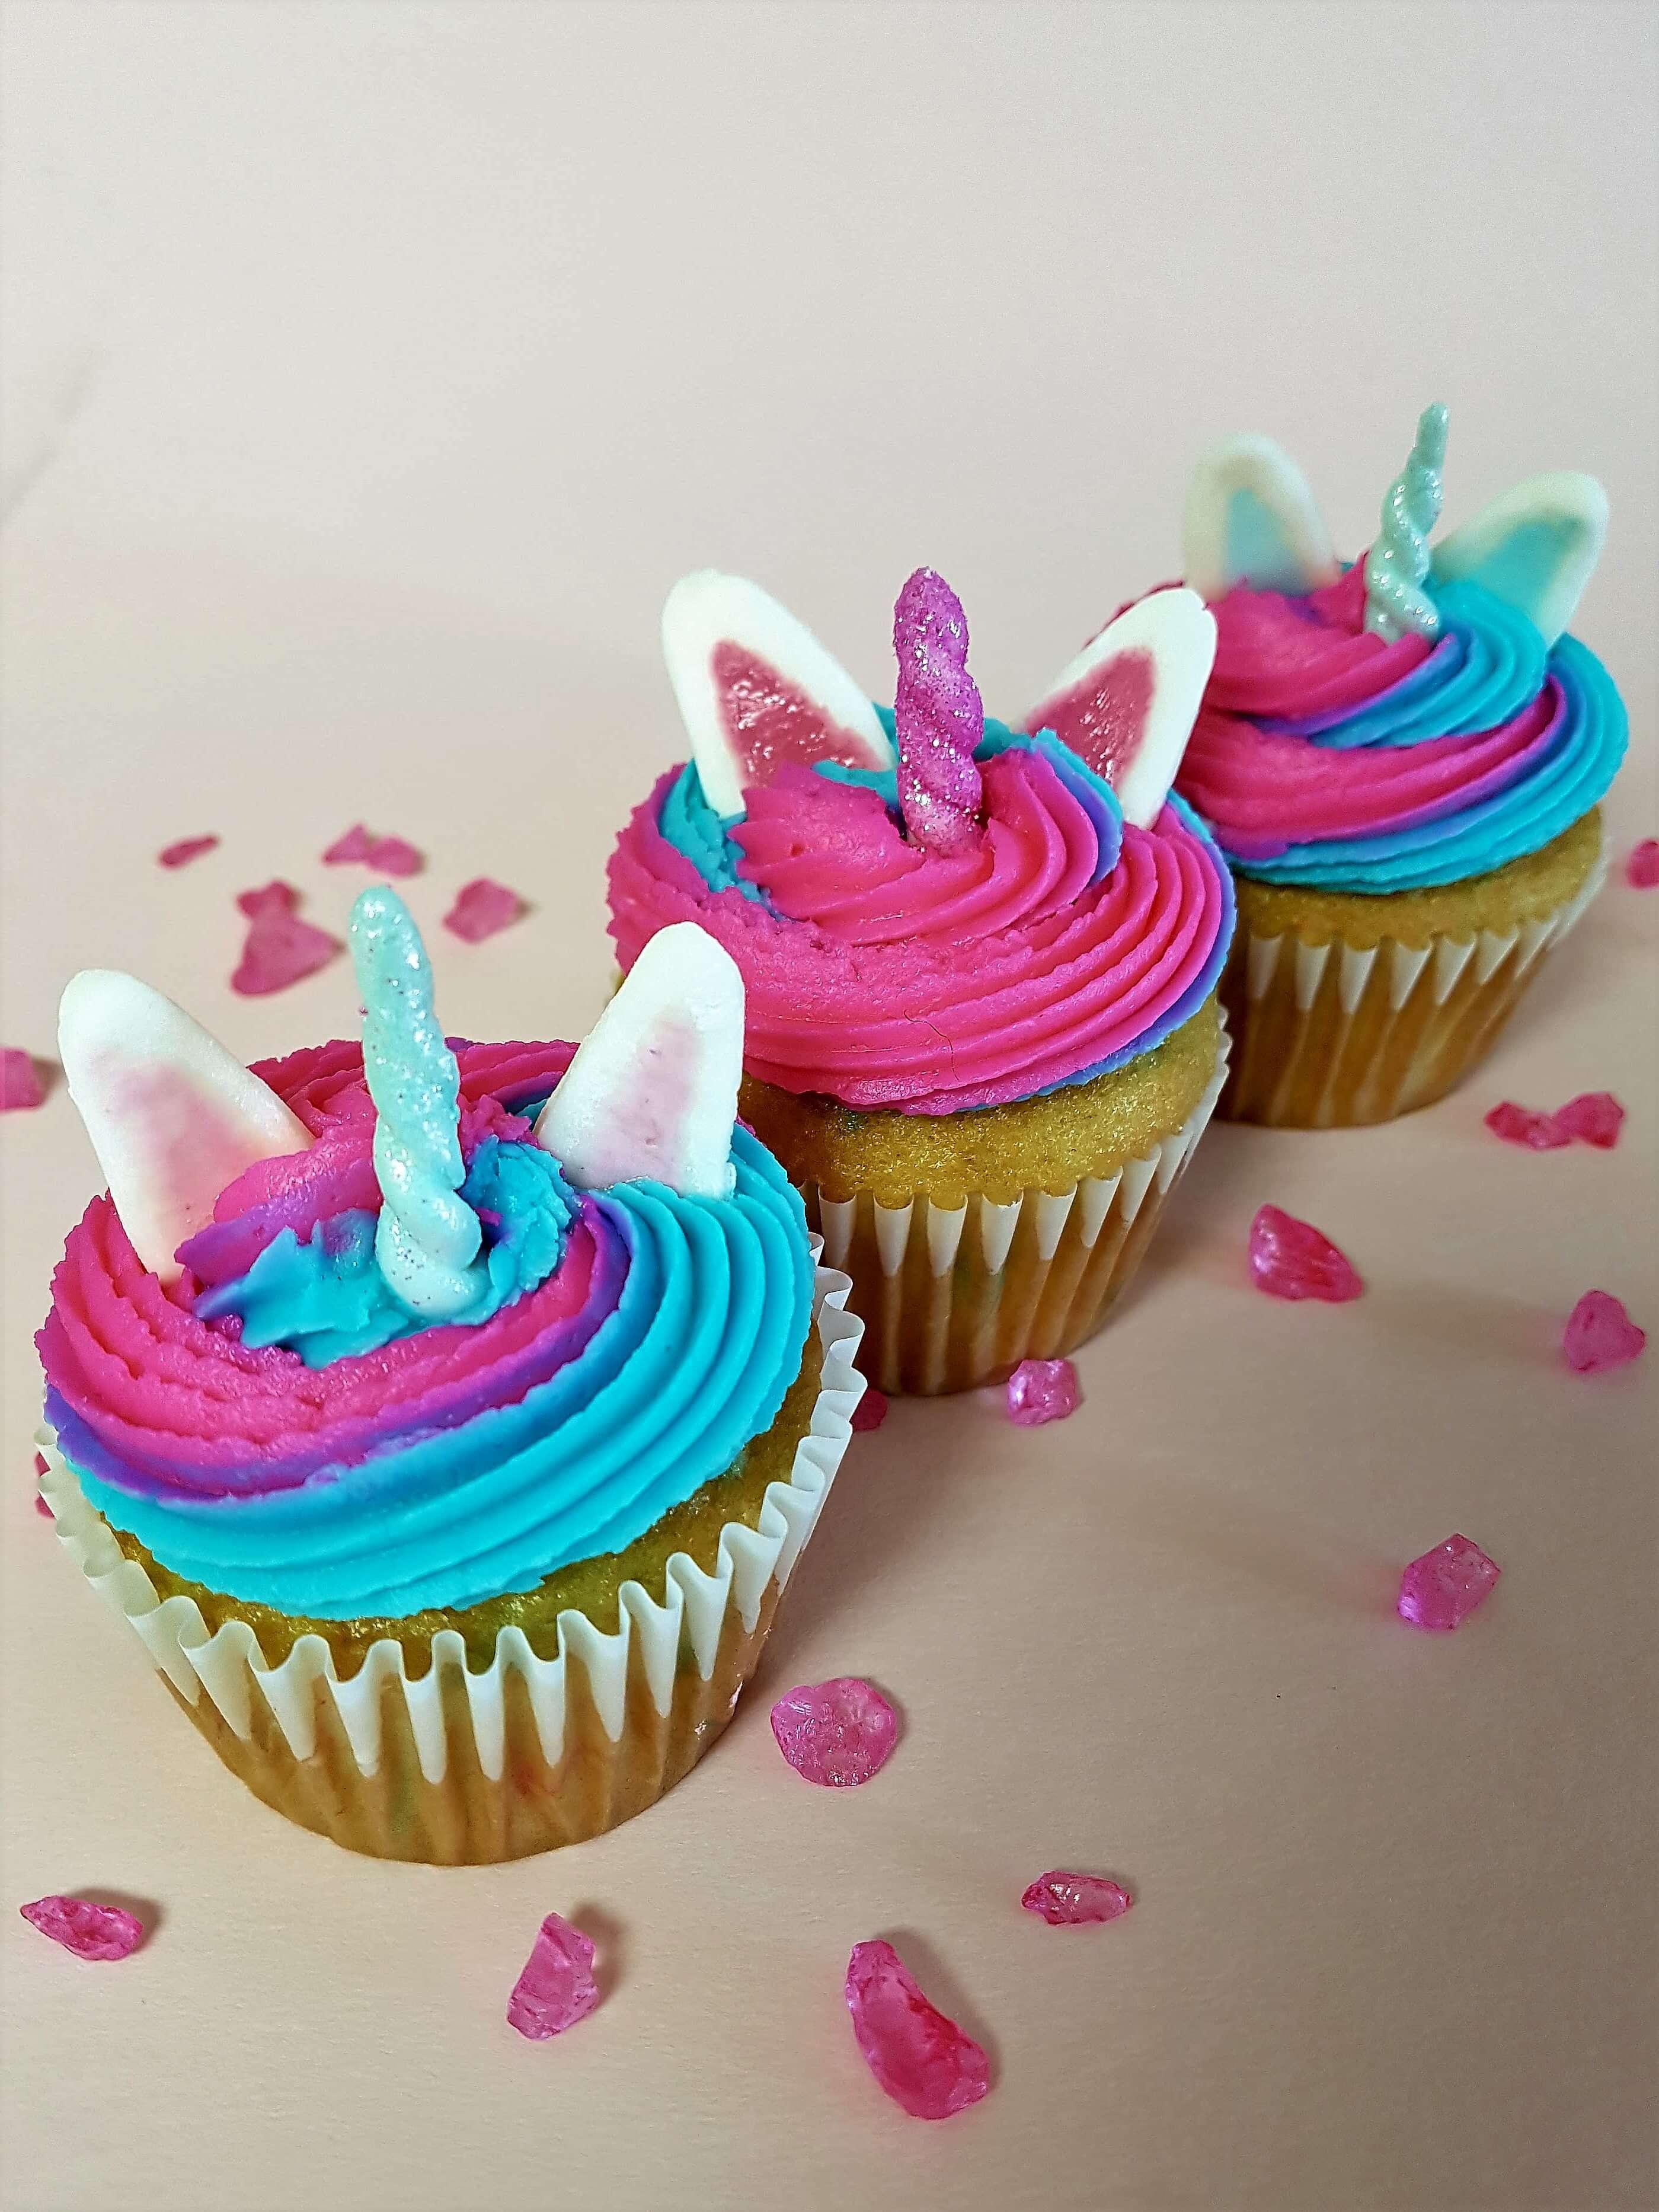 Adorable unicorn cupcakes decorations tots family parenting kids food crafts diy and travel - Creme decoration cupcake ...